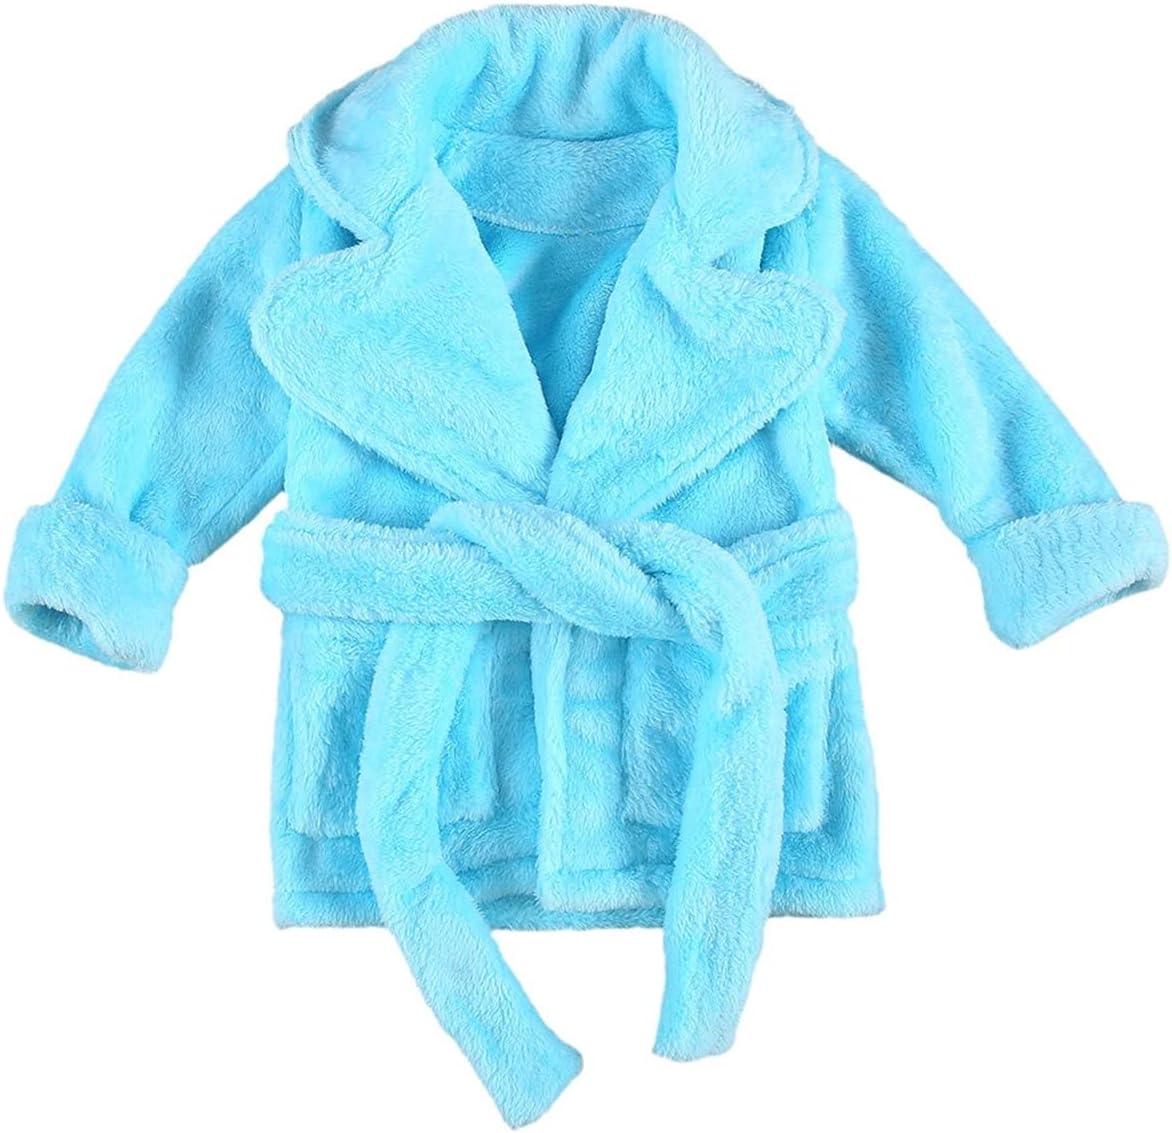 Winter Hooded Children Bathrobe, Kids Fuzzy Bath Robe, Boys Girls Animal Pyjamas, Kids Long Sleeve Cartoon Towel Robe (Color : Blue, Kid Size : 3years)